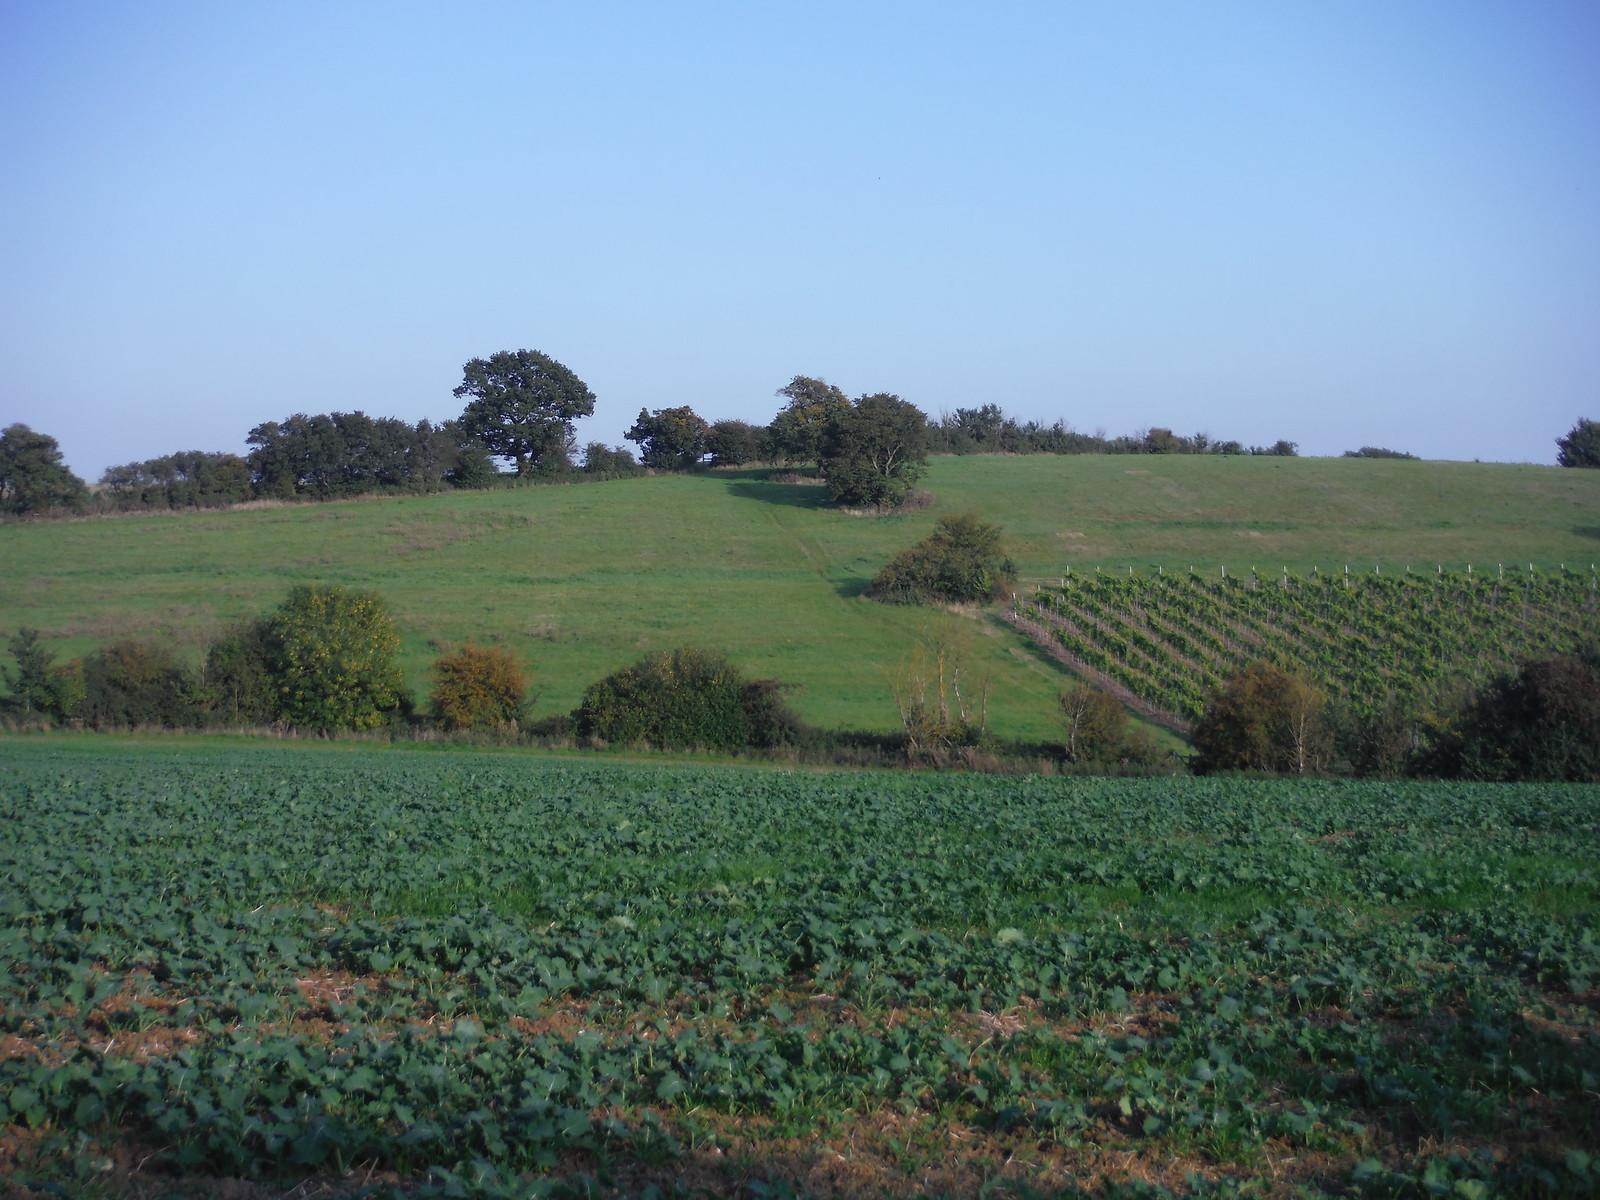 Vineyard in valley, near Hawe's Wood SWC Walk 159 South Woodham Ferrers to North Fambridge